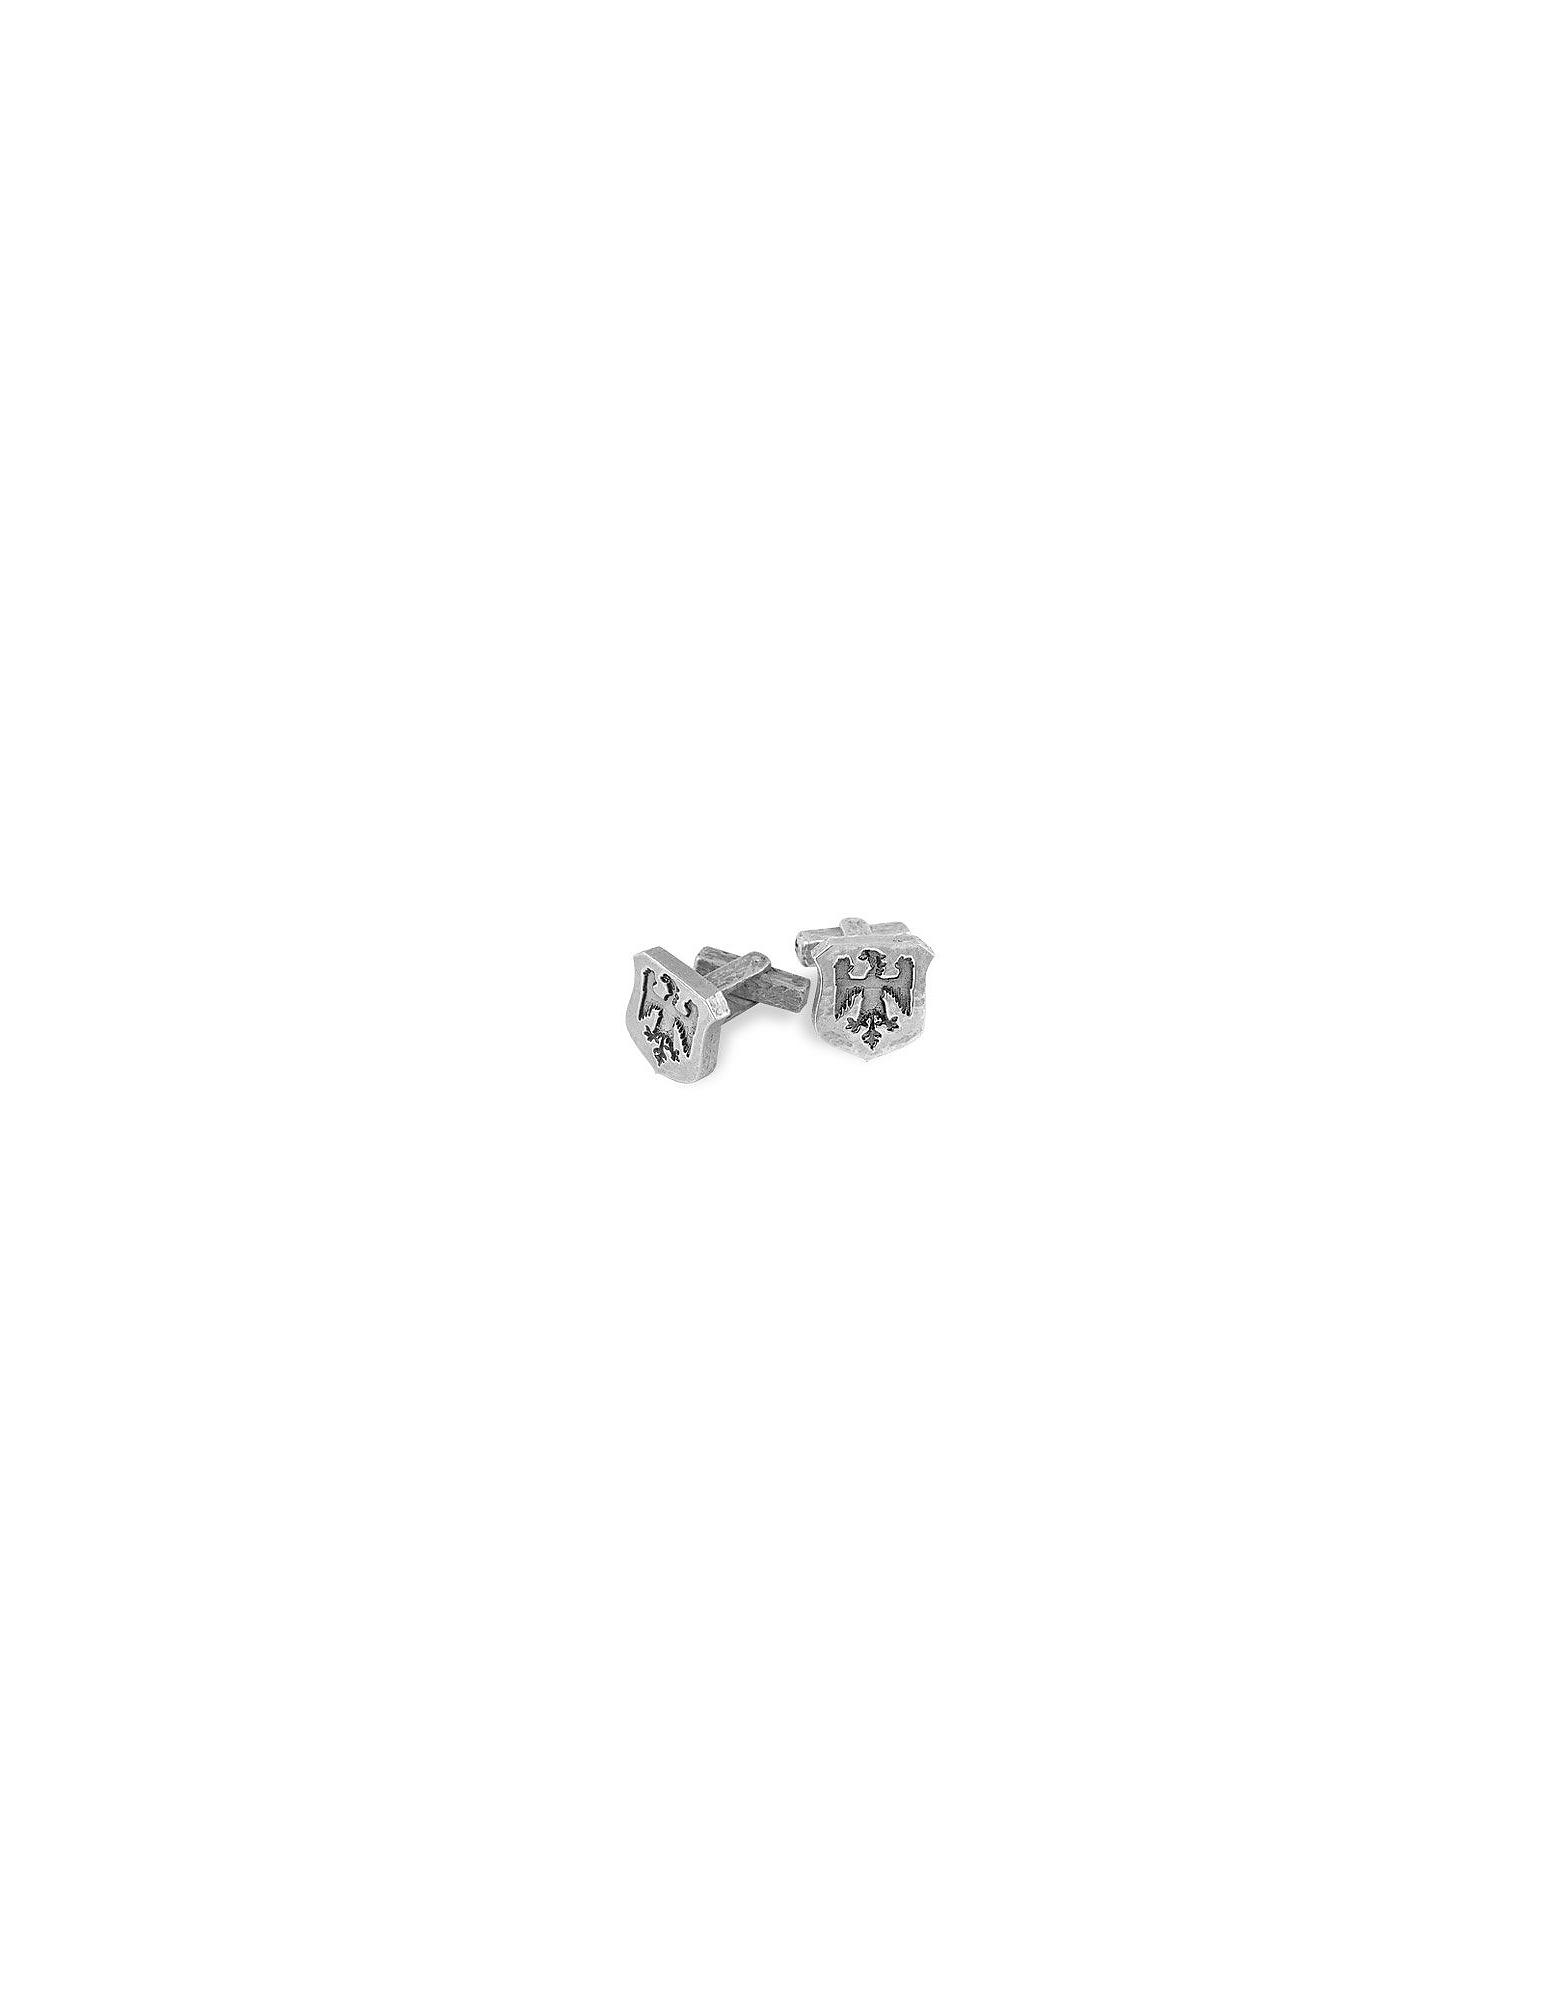 Torrini Cufflinks, Sterling Silver Eagle-Crest Cufflinks